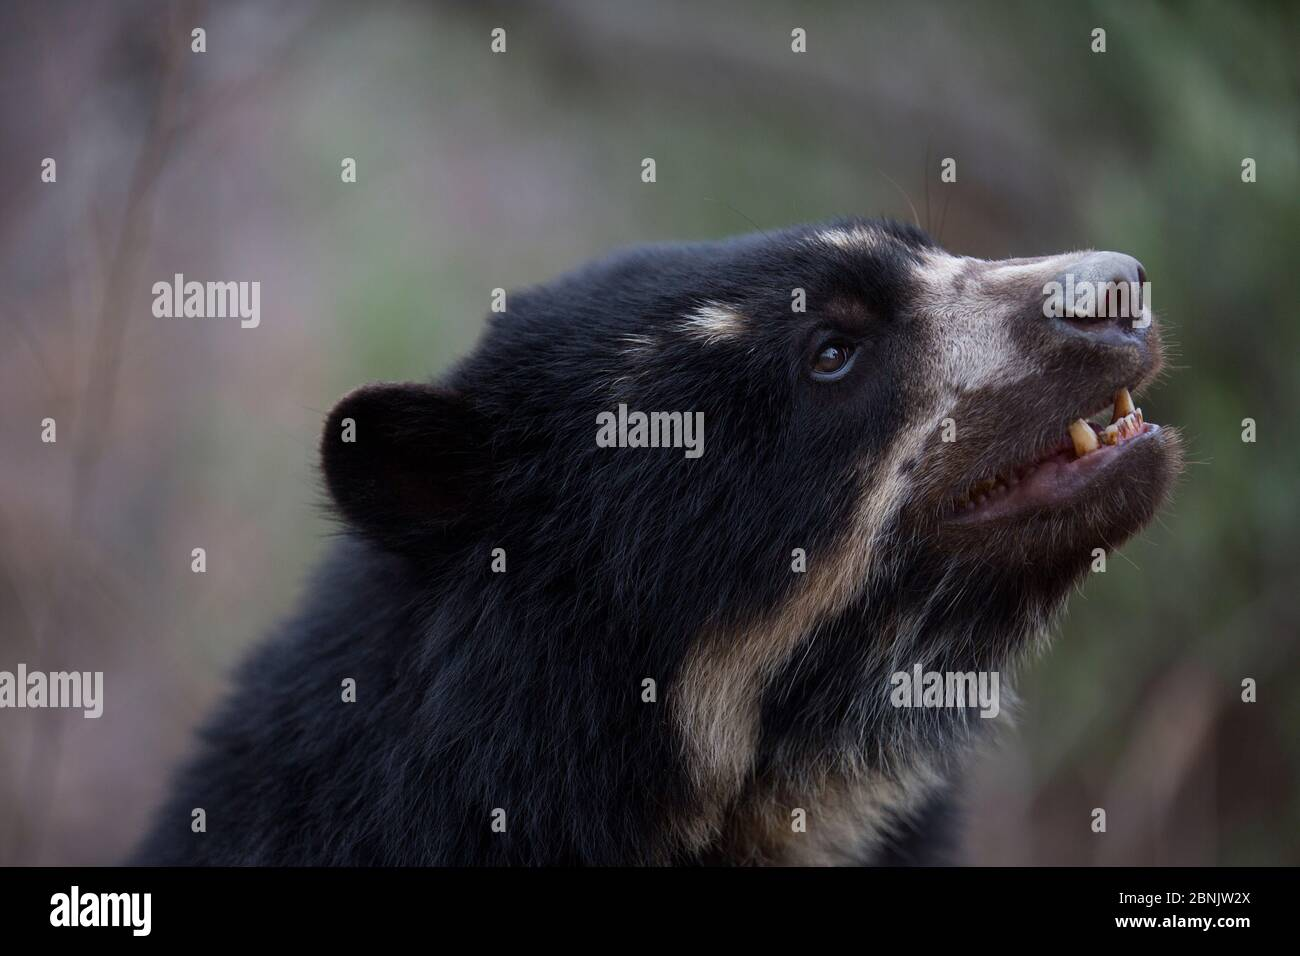 Spectacled bear (Tremarctos ornatus) Chaparri Ecological Reserve, Peru Stock Photo